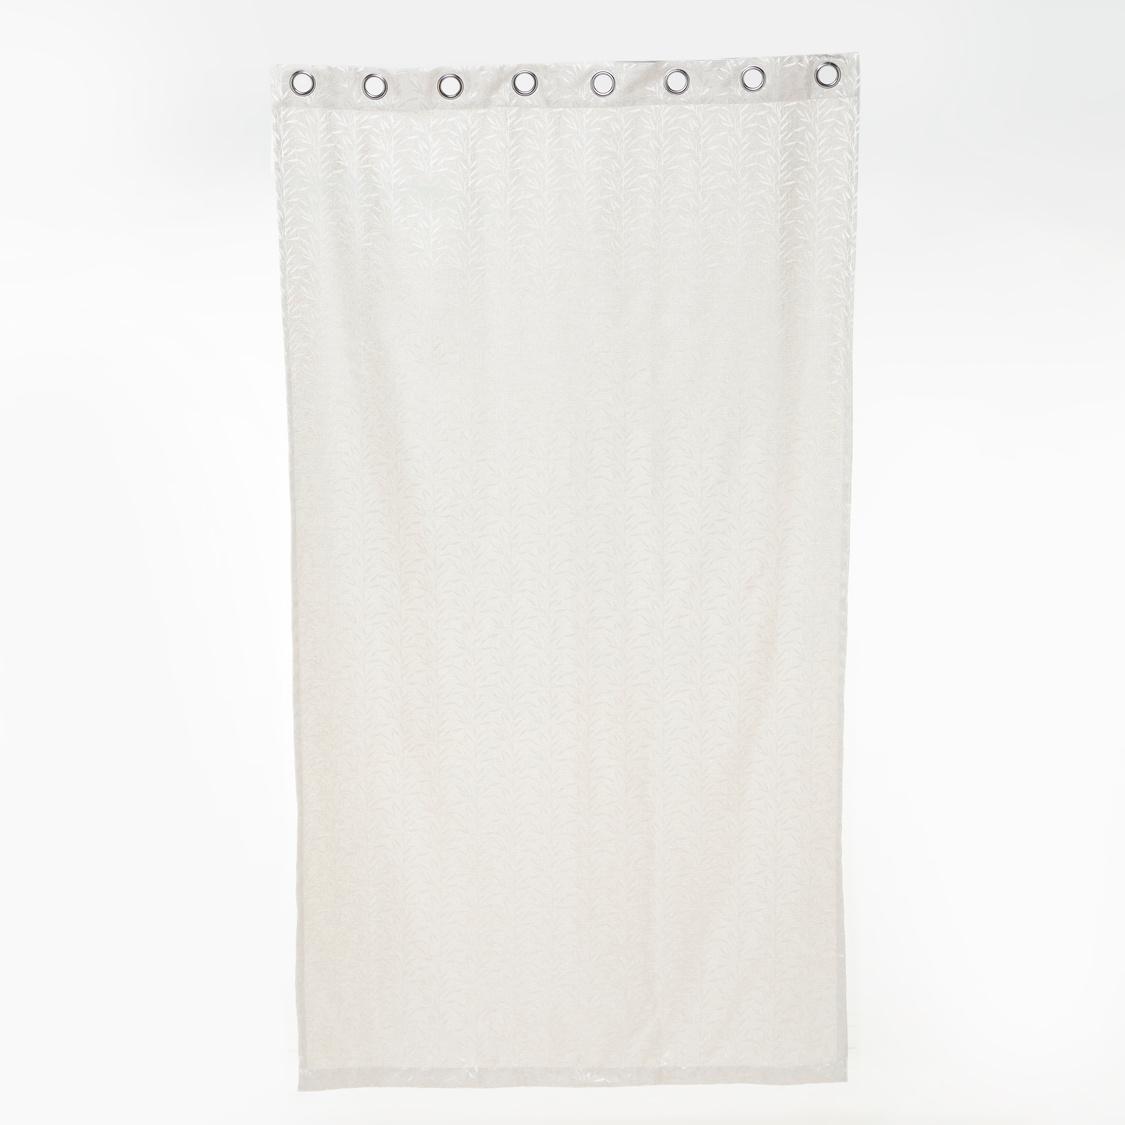 Leaf Print Eyelet Curtain - 135x240 cms